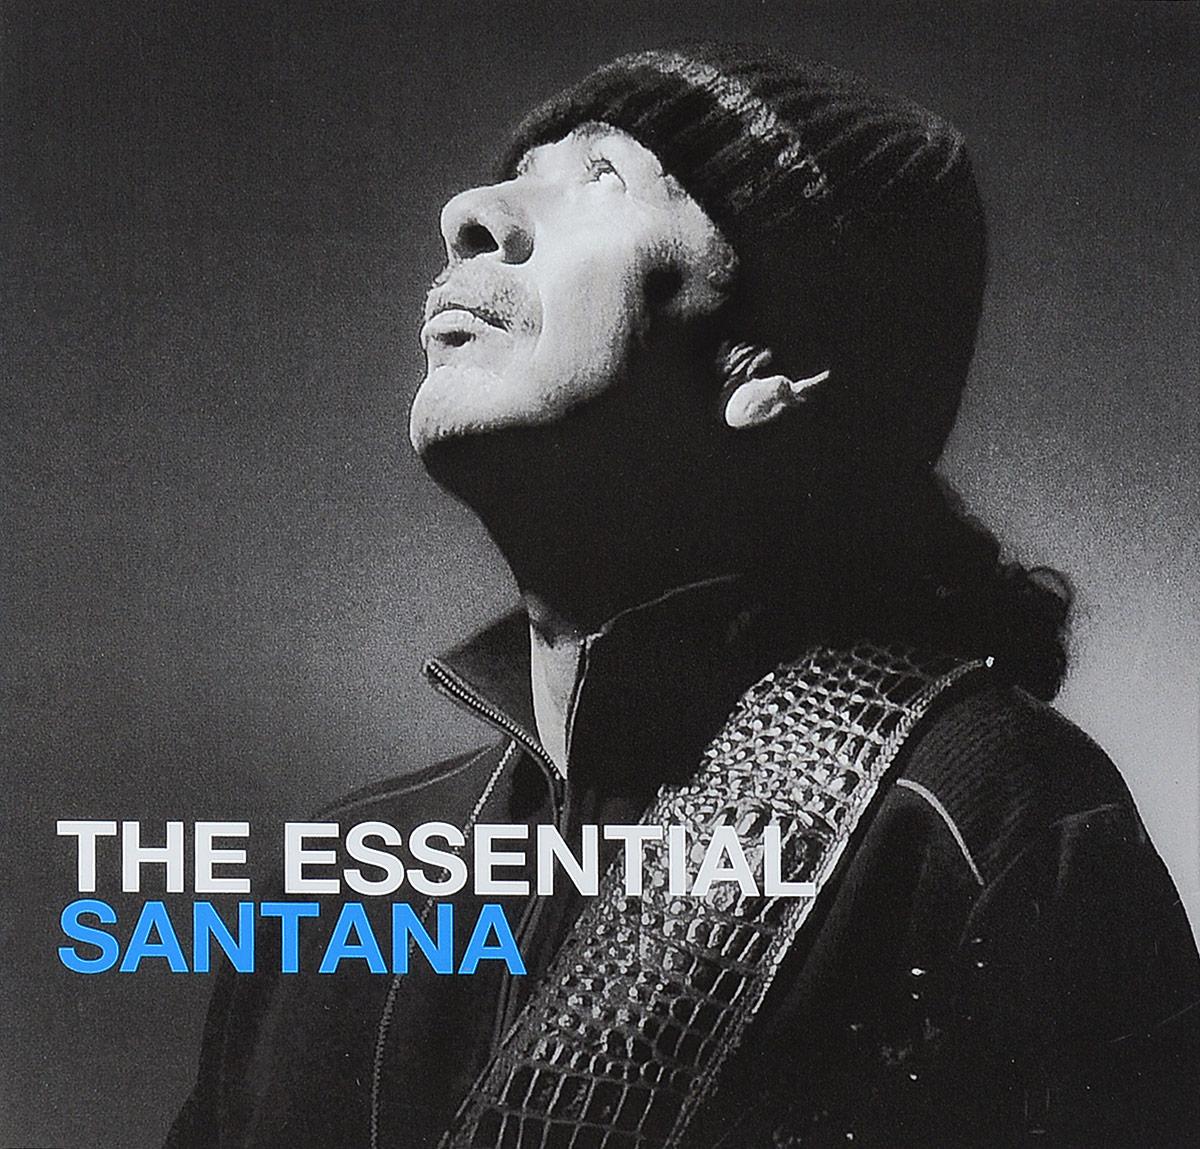 Карлос Сантана Santana. The Essential Santana (2 CD) карлос д алеззио carlos d alessio india song 2 cd